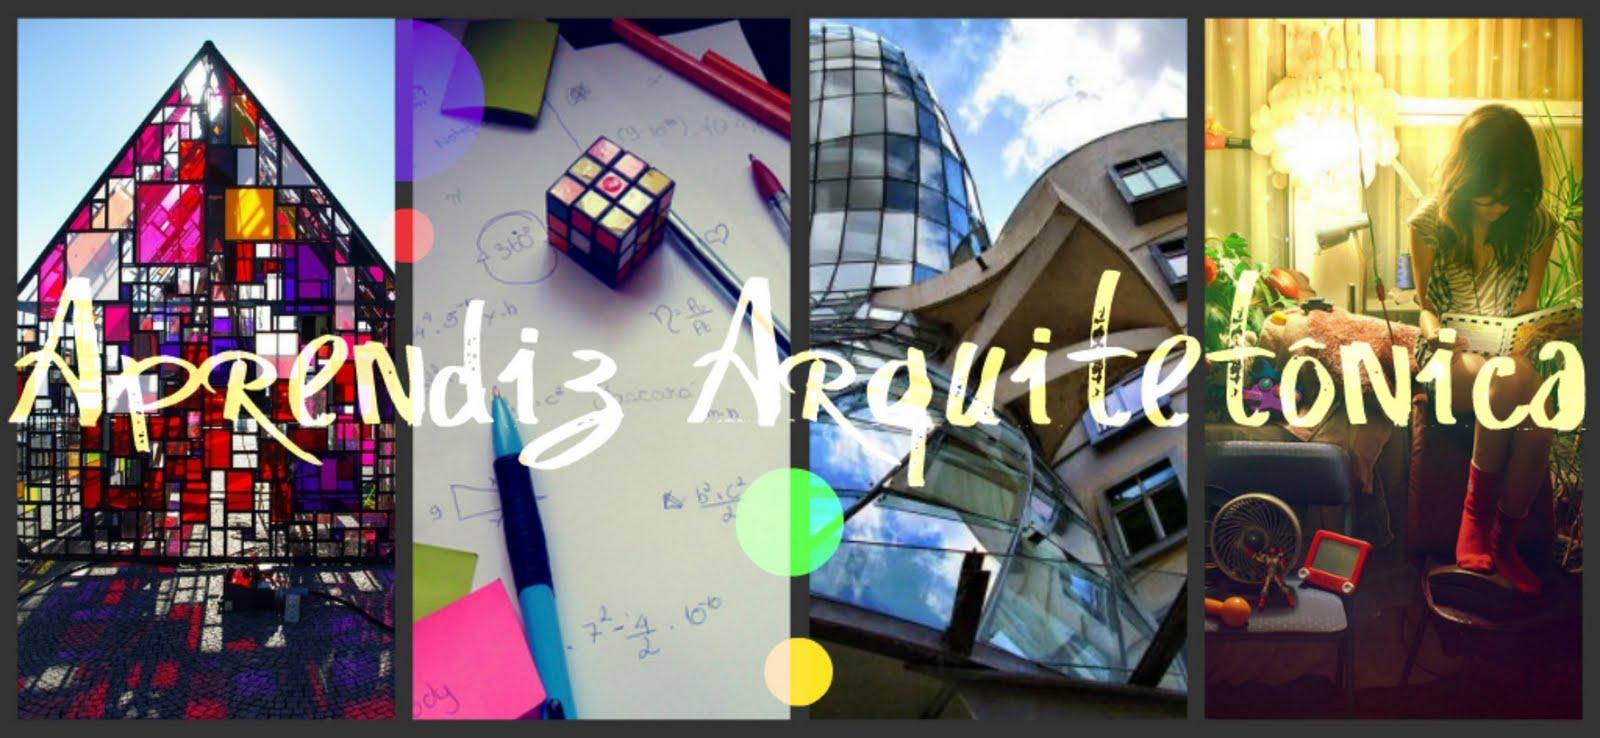 Aprendiz Arquitetônica